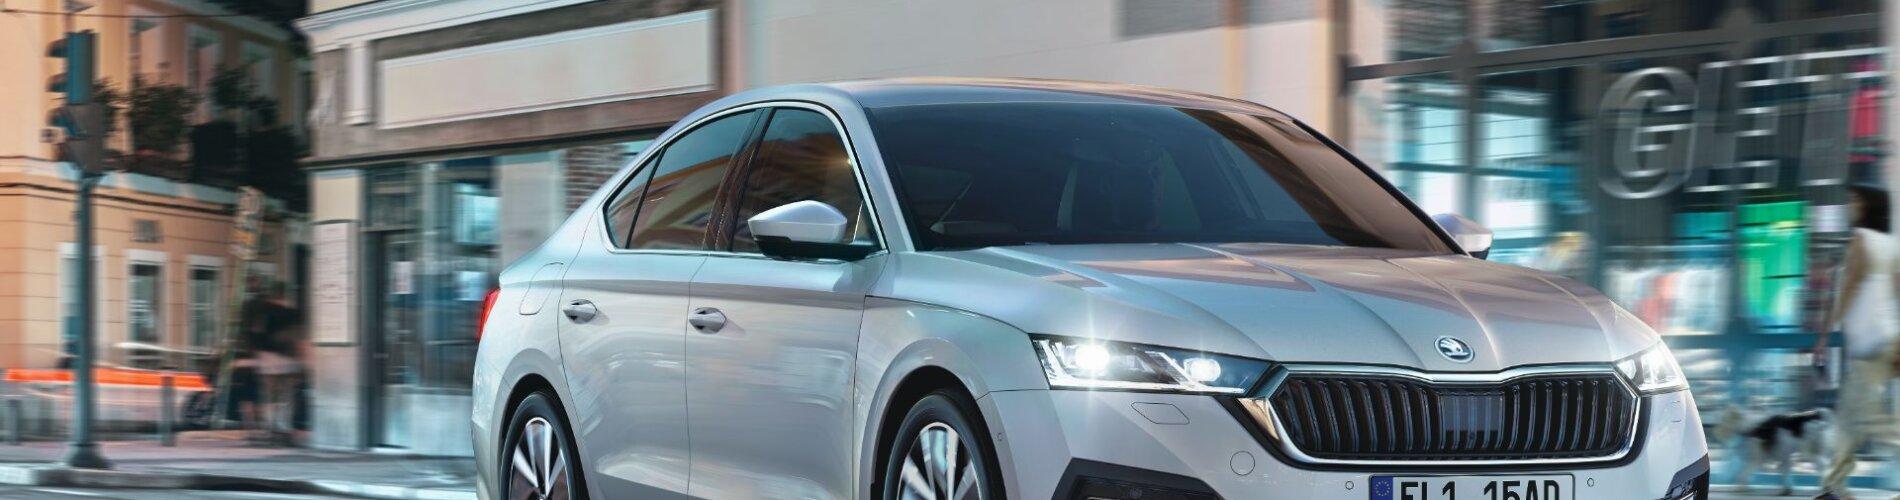 Skoda Octavia iV coupe/hatchback